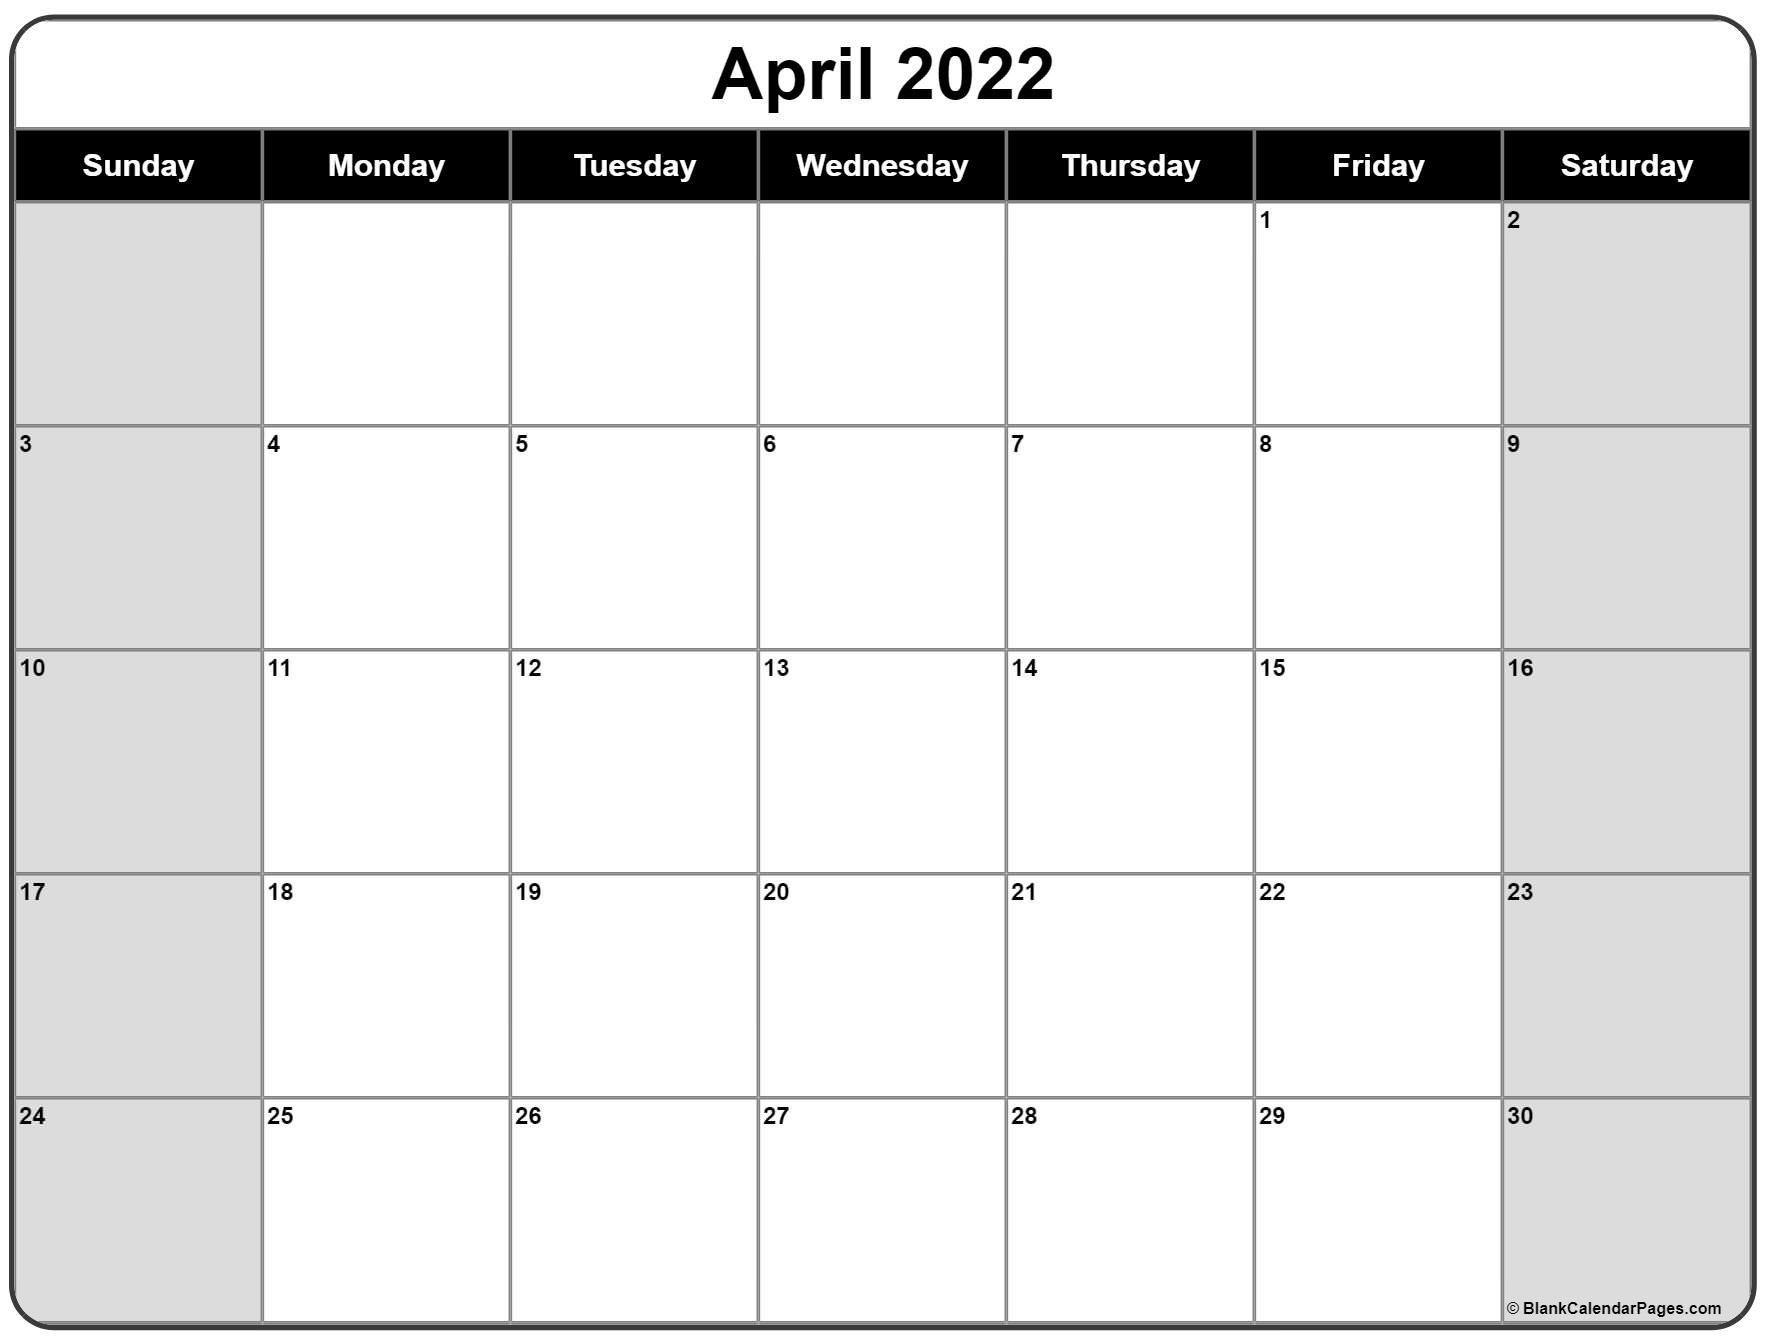 April 2022 Calendar   Free Printable Calendar Templates in April 2022 Calendar To Print